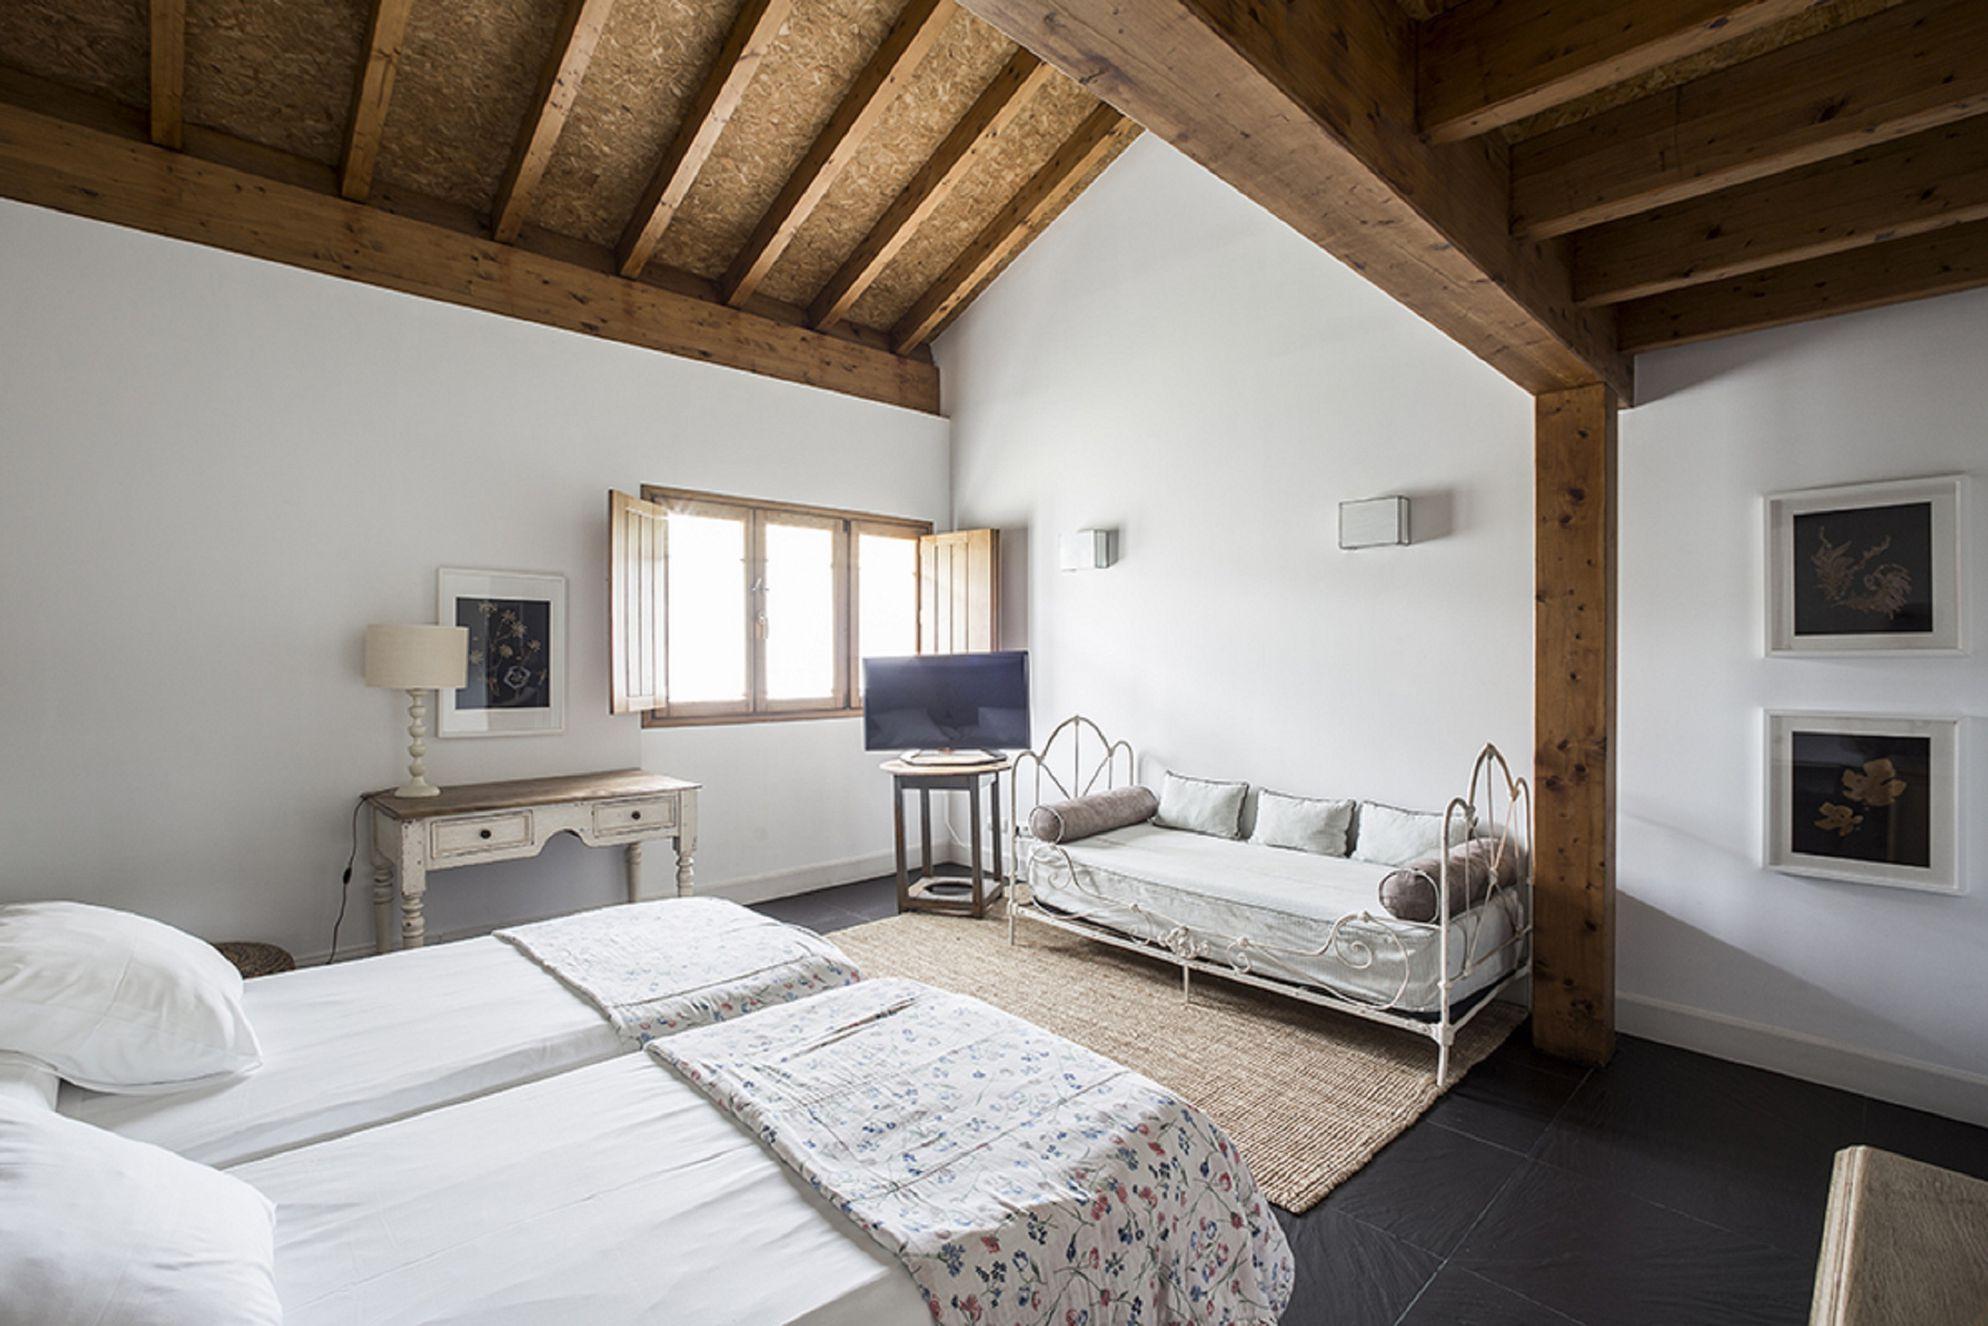 Casa rural Errota-Barri - Gallery